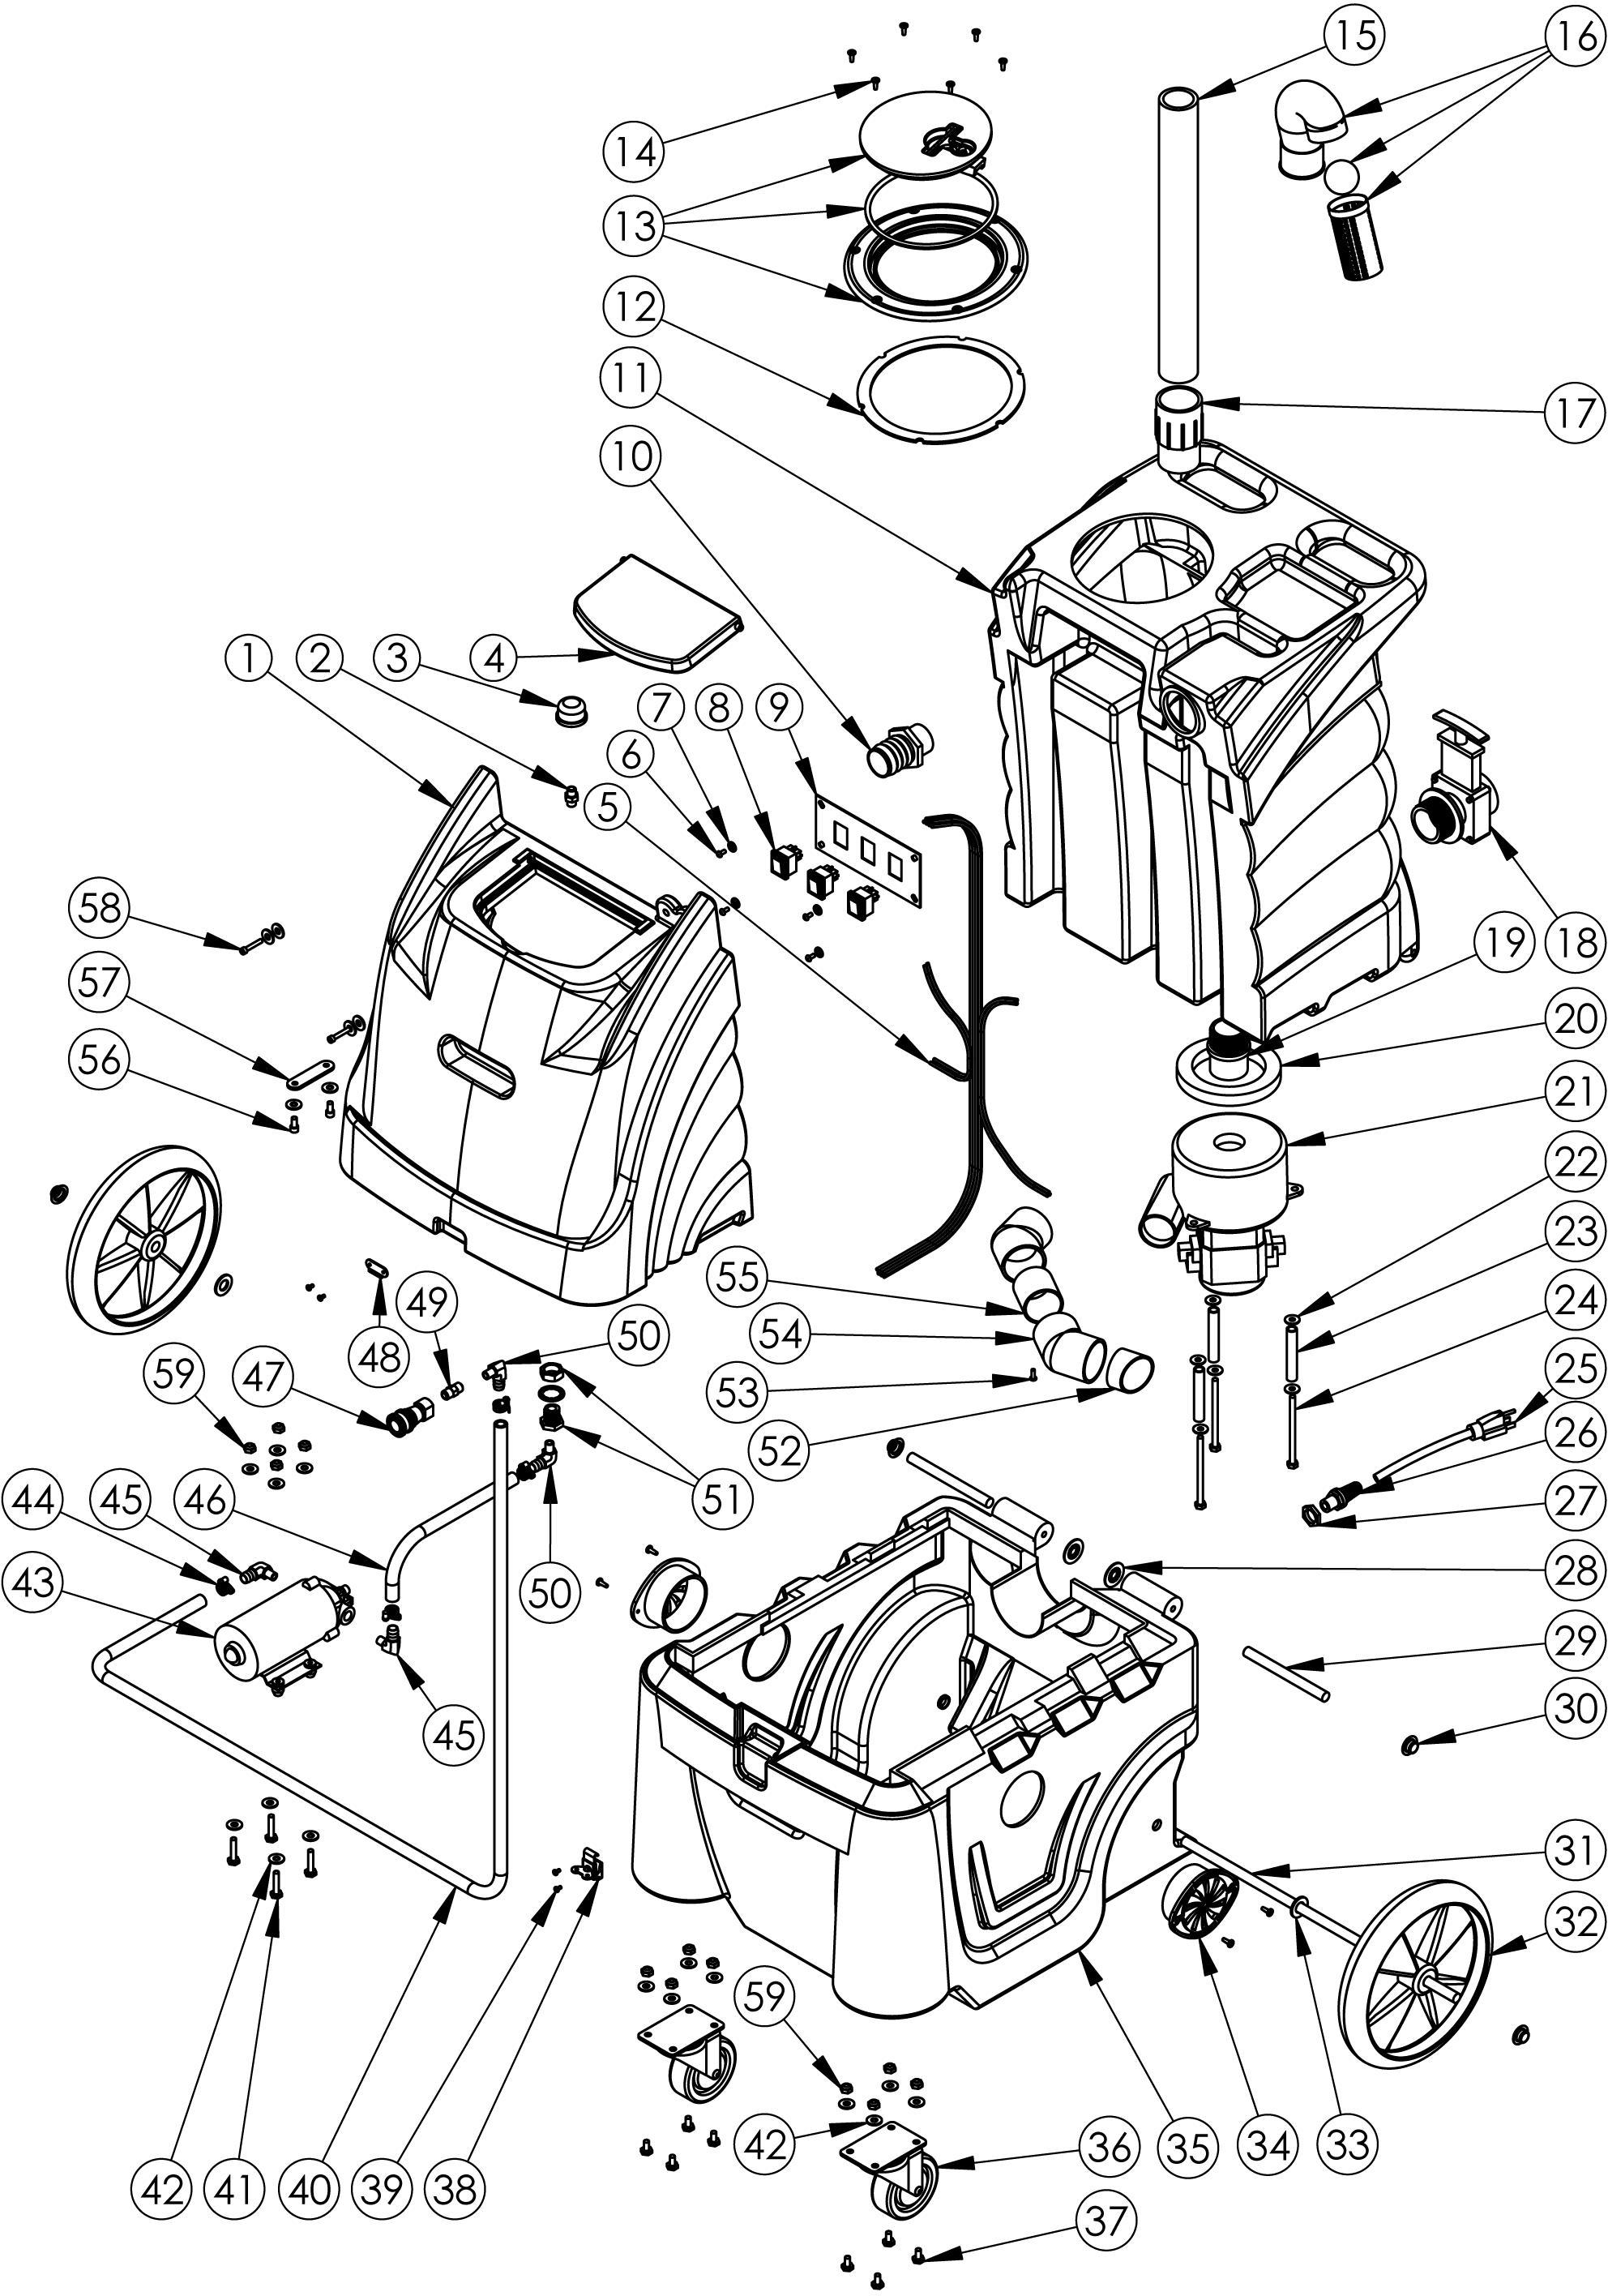 Sandia 86 R 6 Gallon Extractor